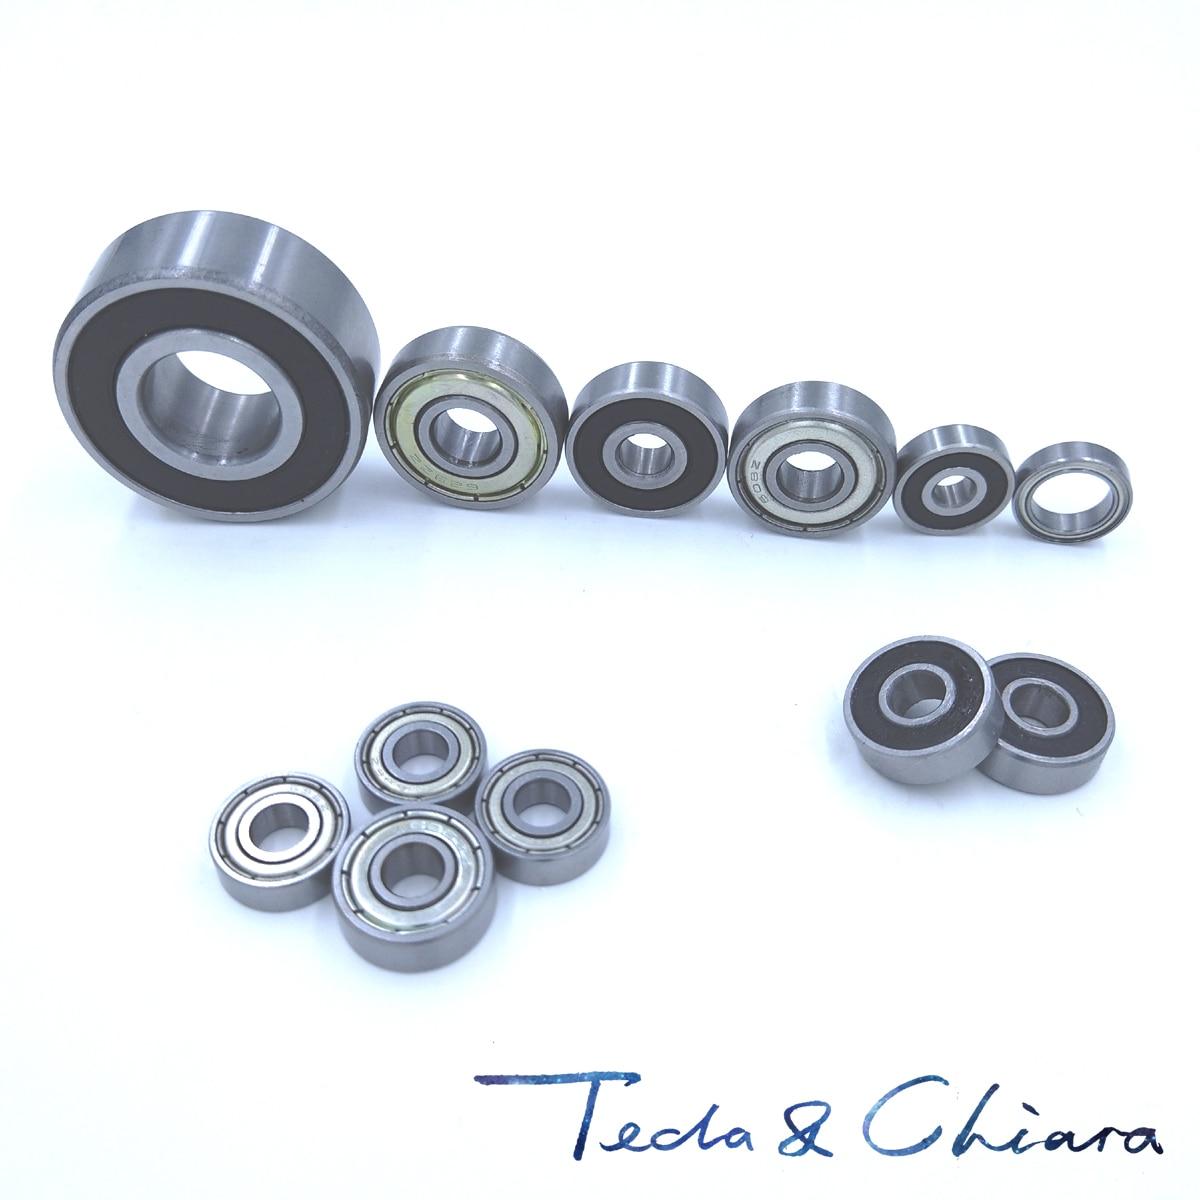 688 688ZZ 688RS 688-2Z 688Z 688-2RS ZZ RS RZ 2RZ Deep Groove Ball Bearings 8 x 16 x 5mm